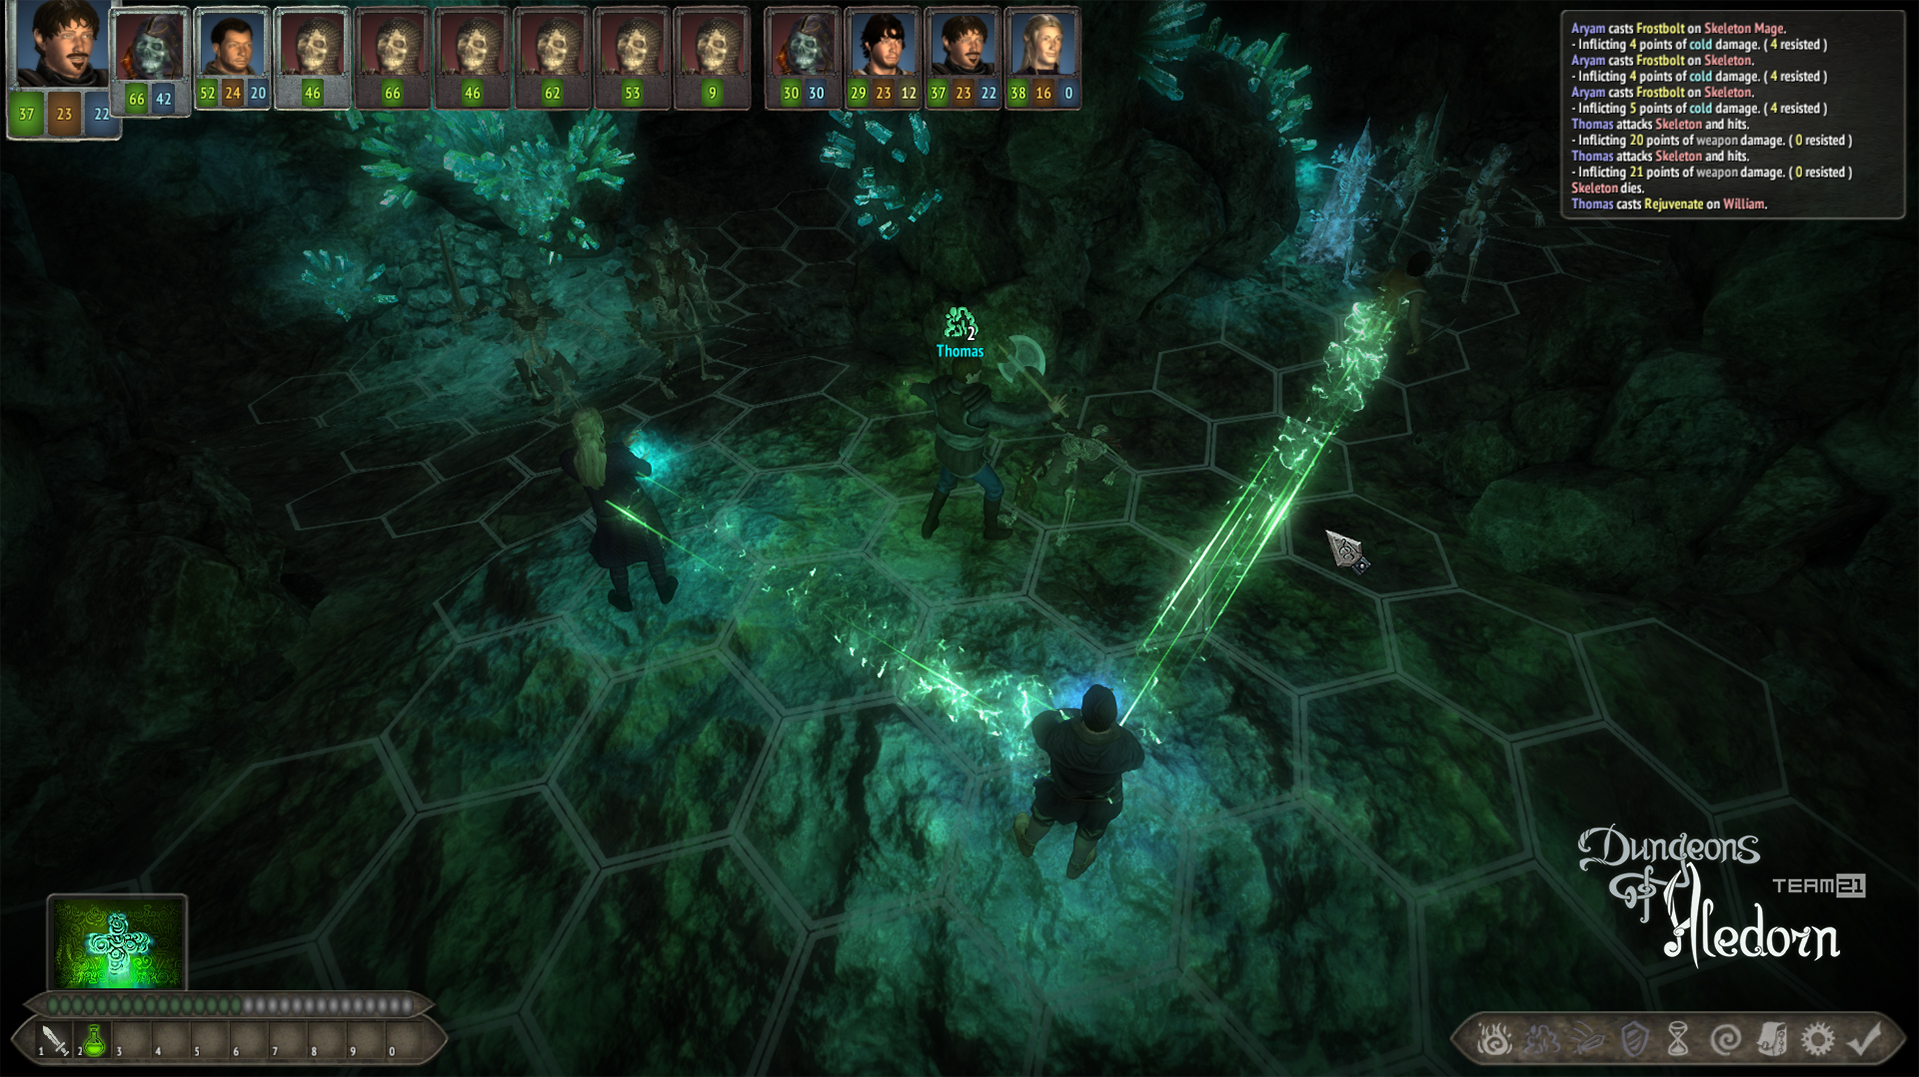 Steam Greenlight :: Dungeons of Aledorn